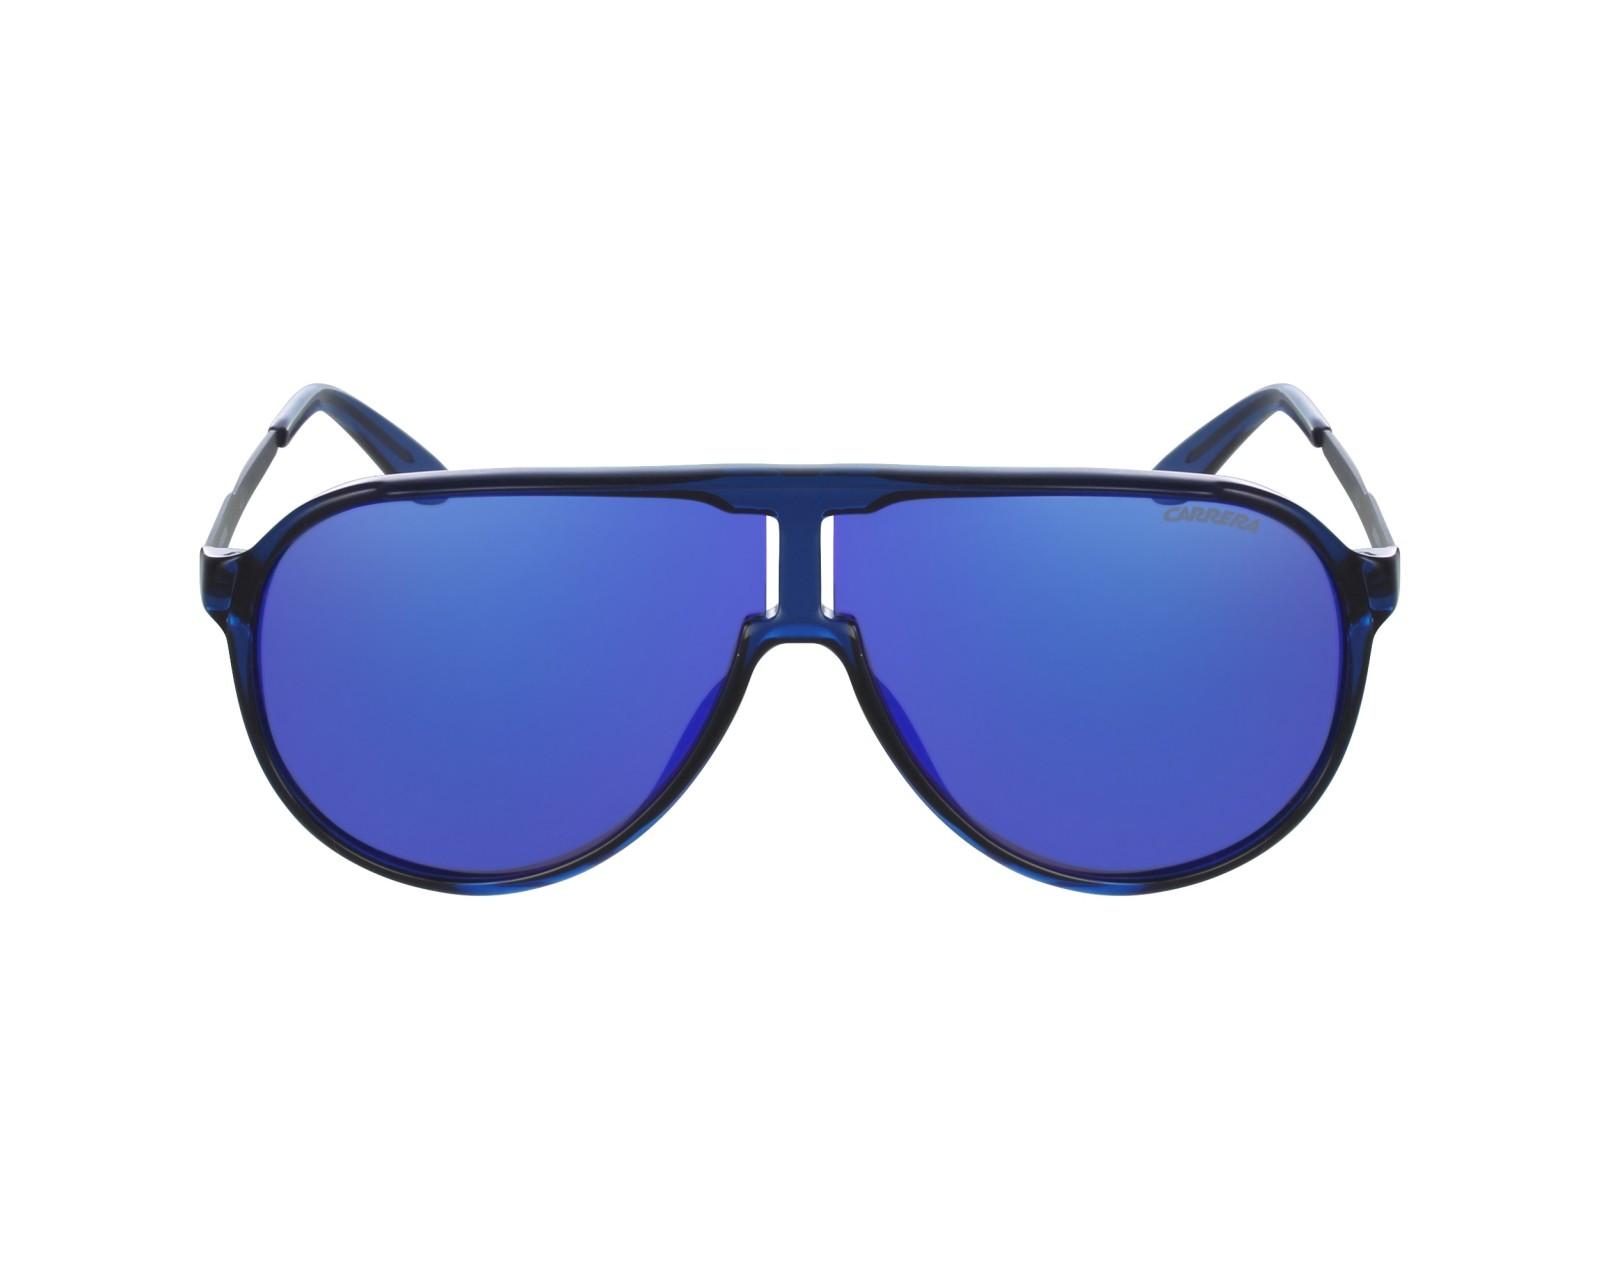 45048a6a3adab1 Lunettes de soleil Carrera New-Champion 8FS Z0 - Bleu Pierre vue de profil